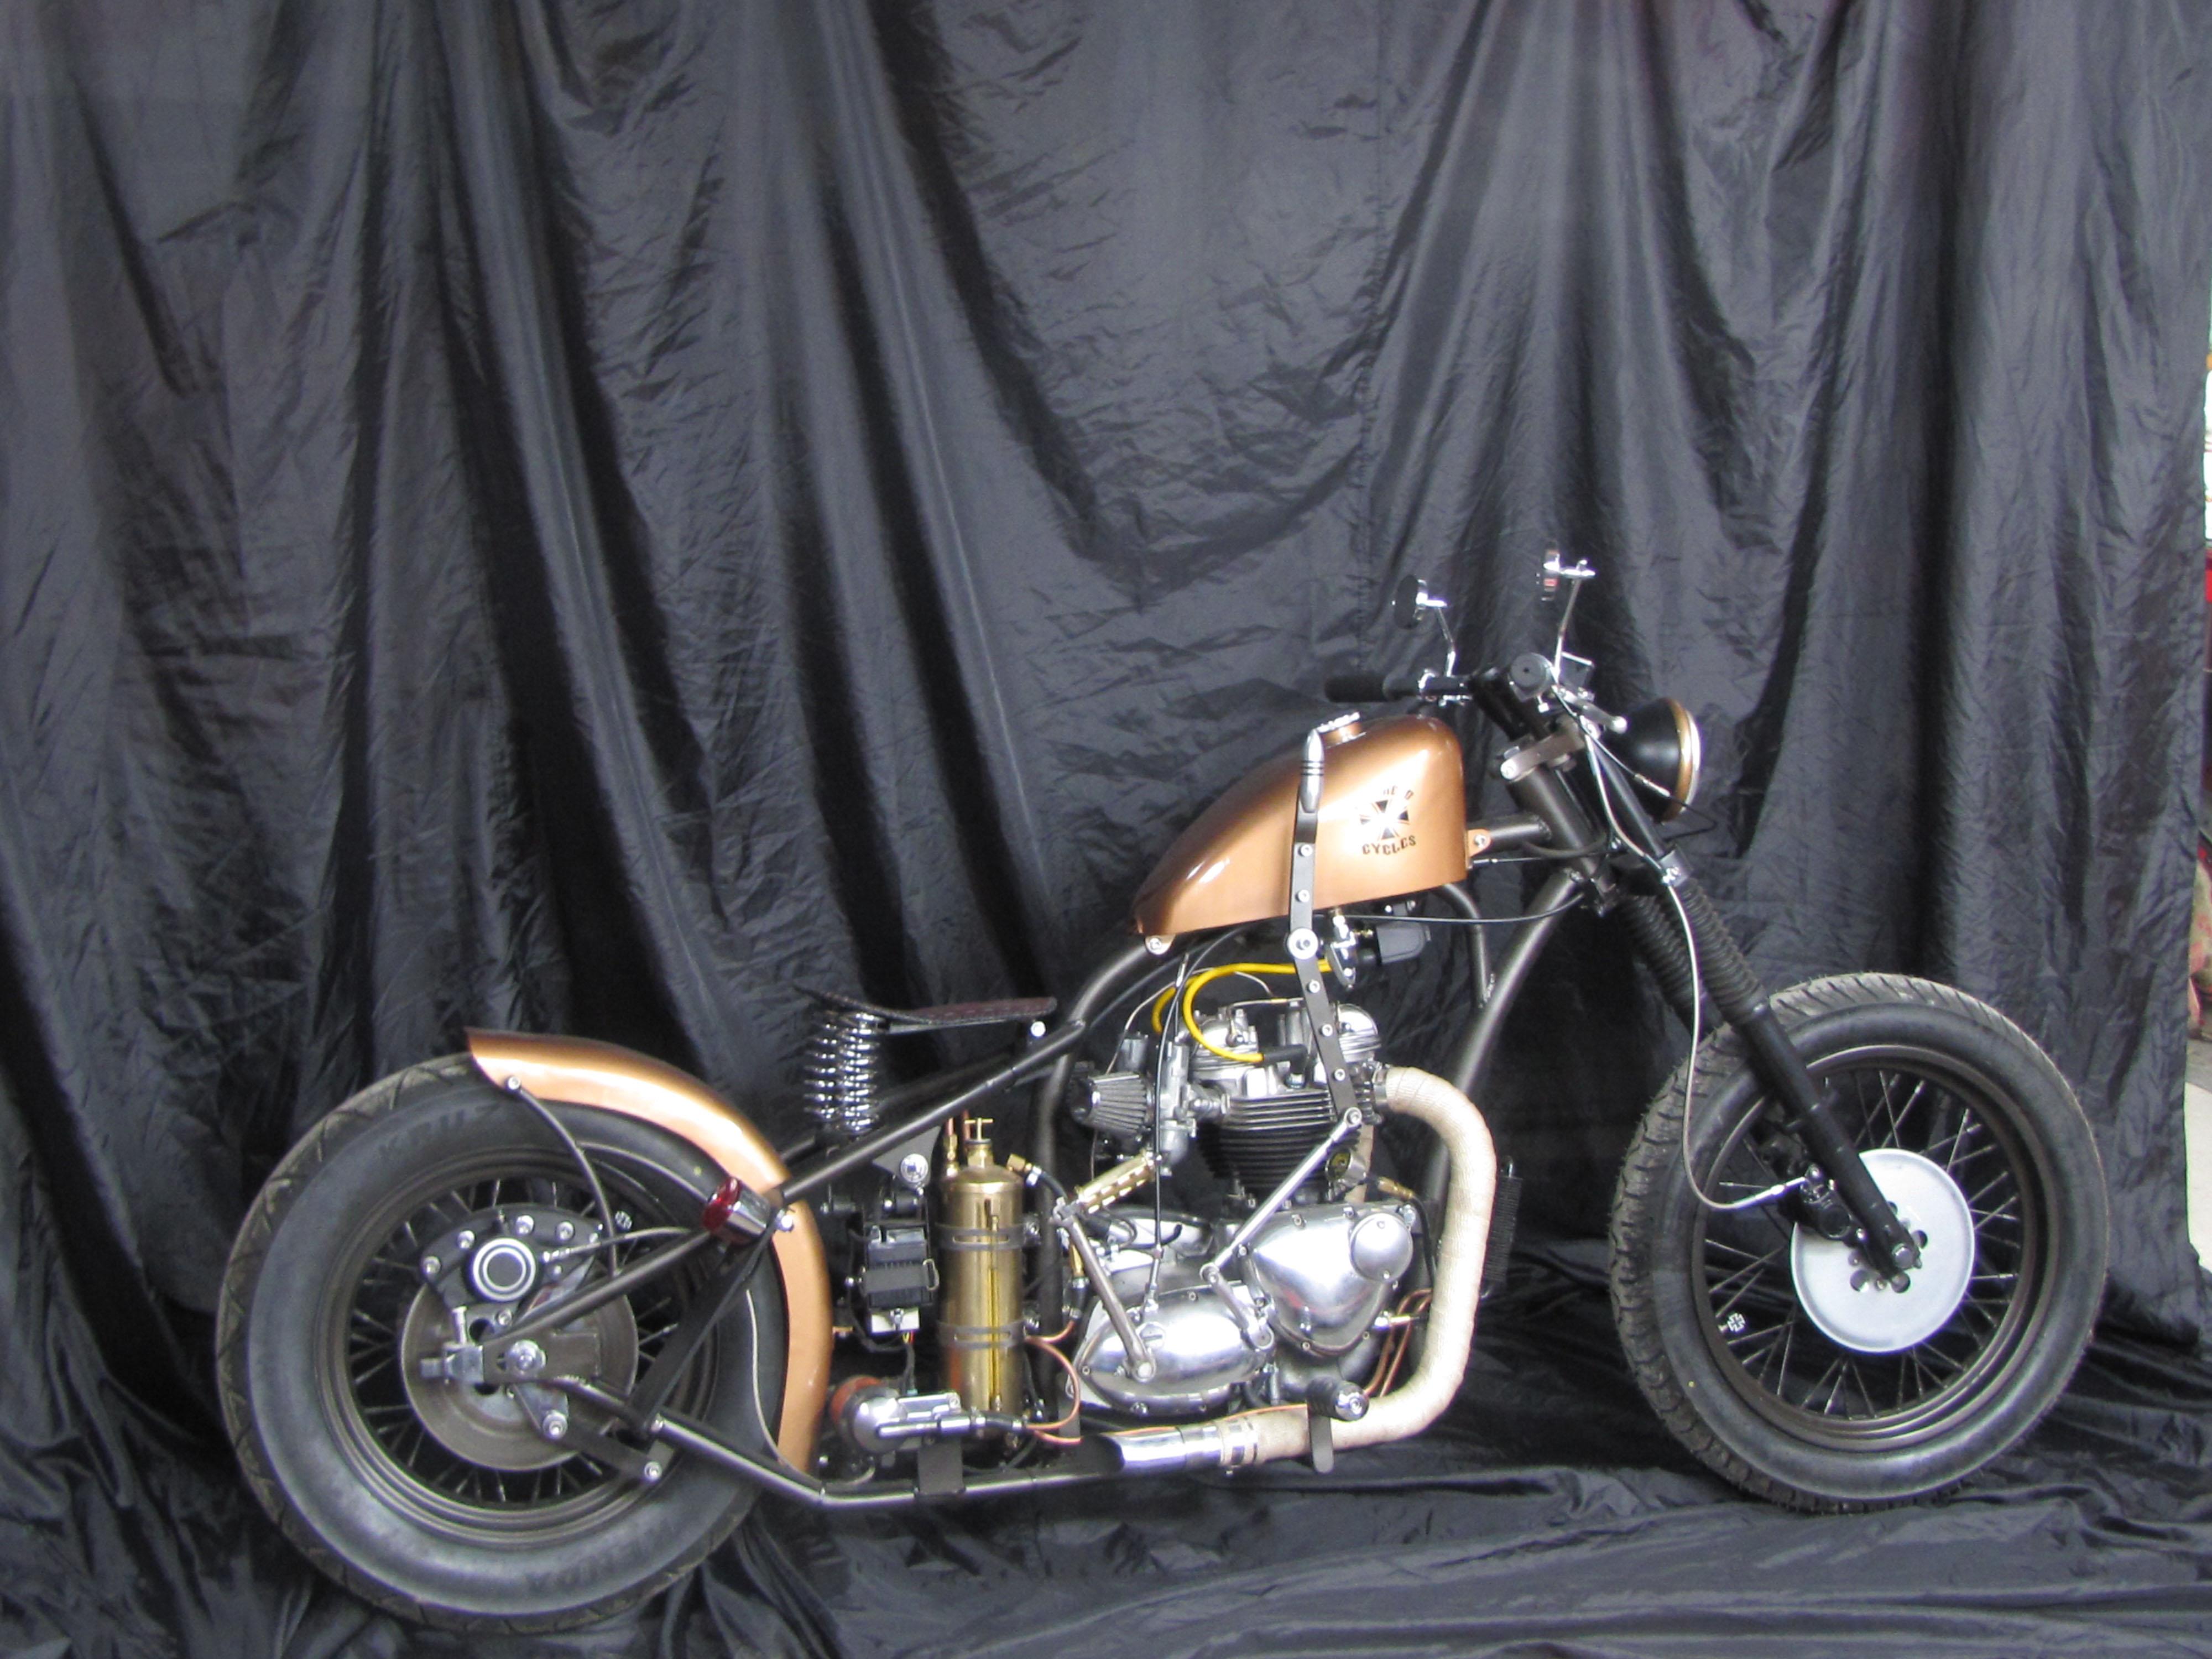 bikes/customer/mpage_tri_tr6r_chopper_003 jpg